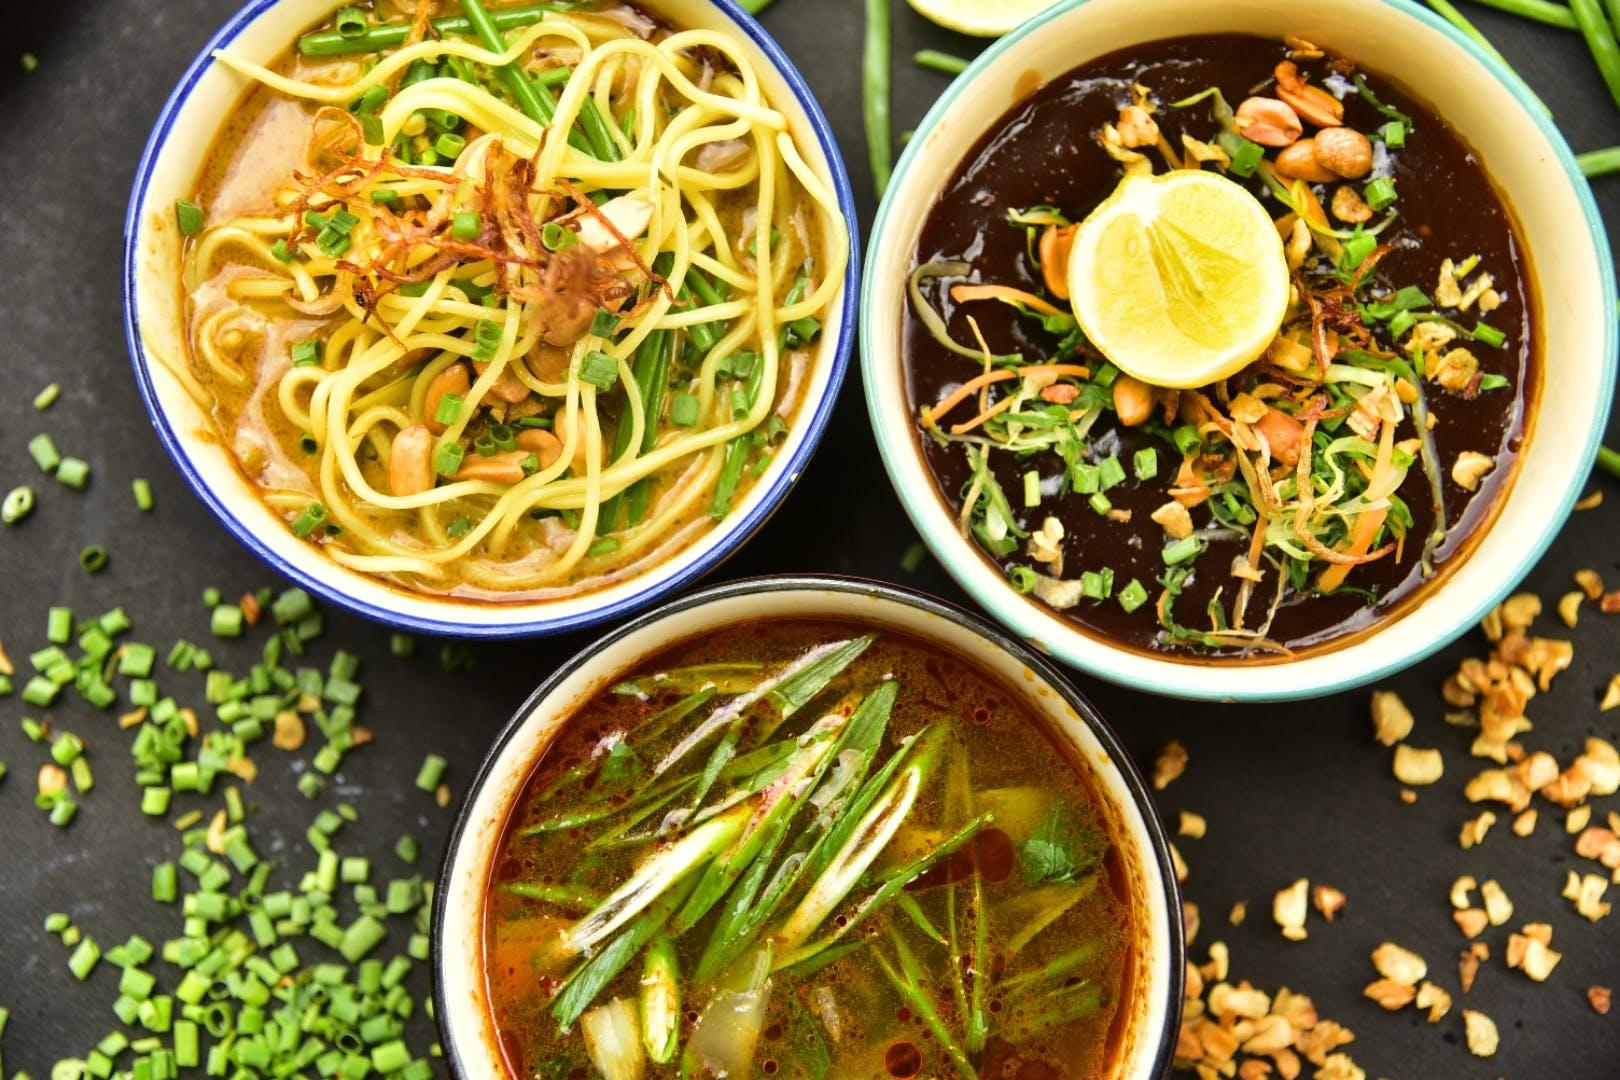 Dish,Food,Cuisine,Ingredient,Soba,Noodle,Produce,Kongnamul,Bean sprouts,Vegetarian food